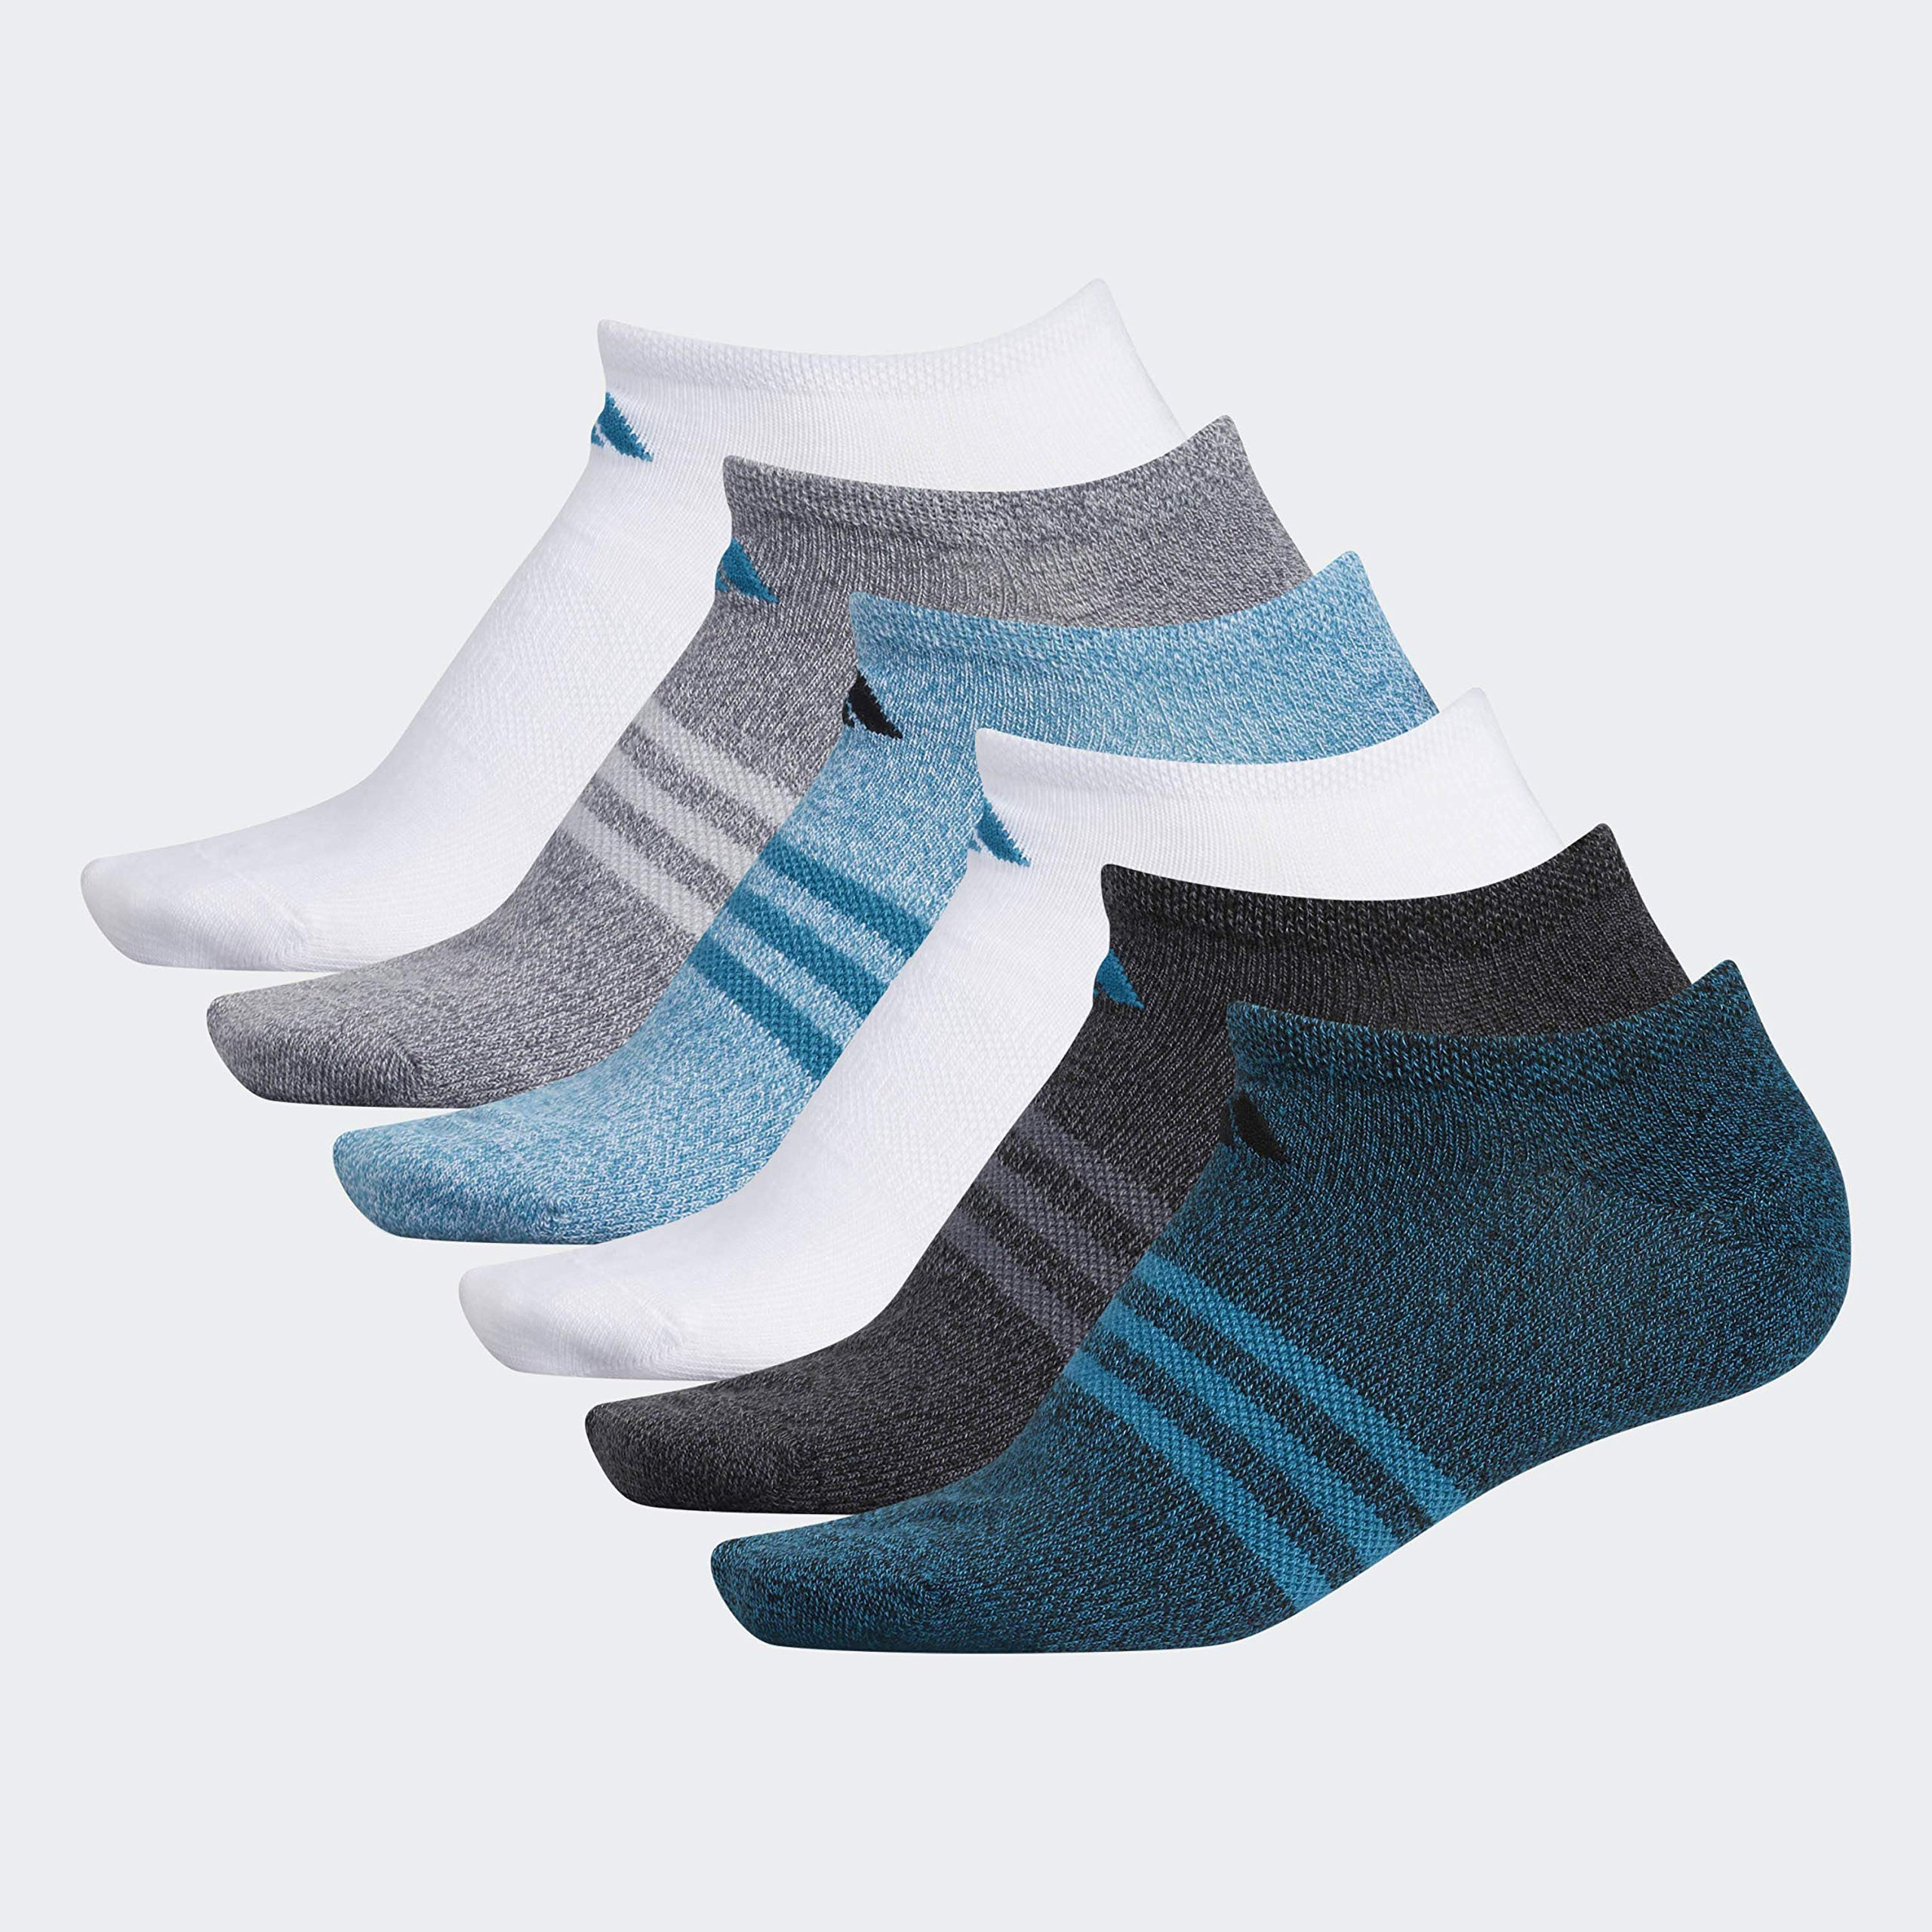 adidas Women's Superlite No Show Socks (6-Pair), Black - Active Teal Marl/Black - Onix Marl/White/Activ, Medium, (Shoe Size 5-10) by adidas